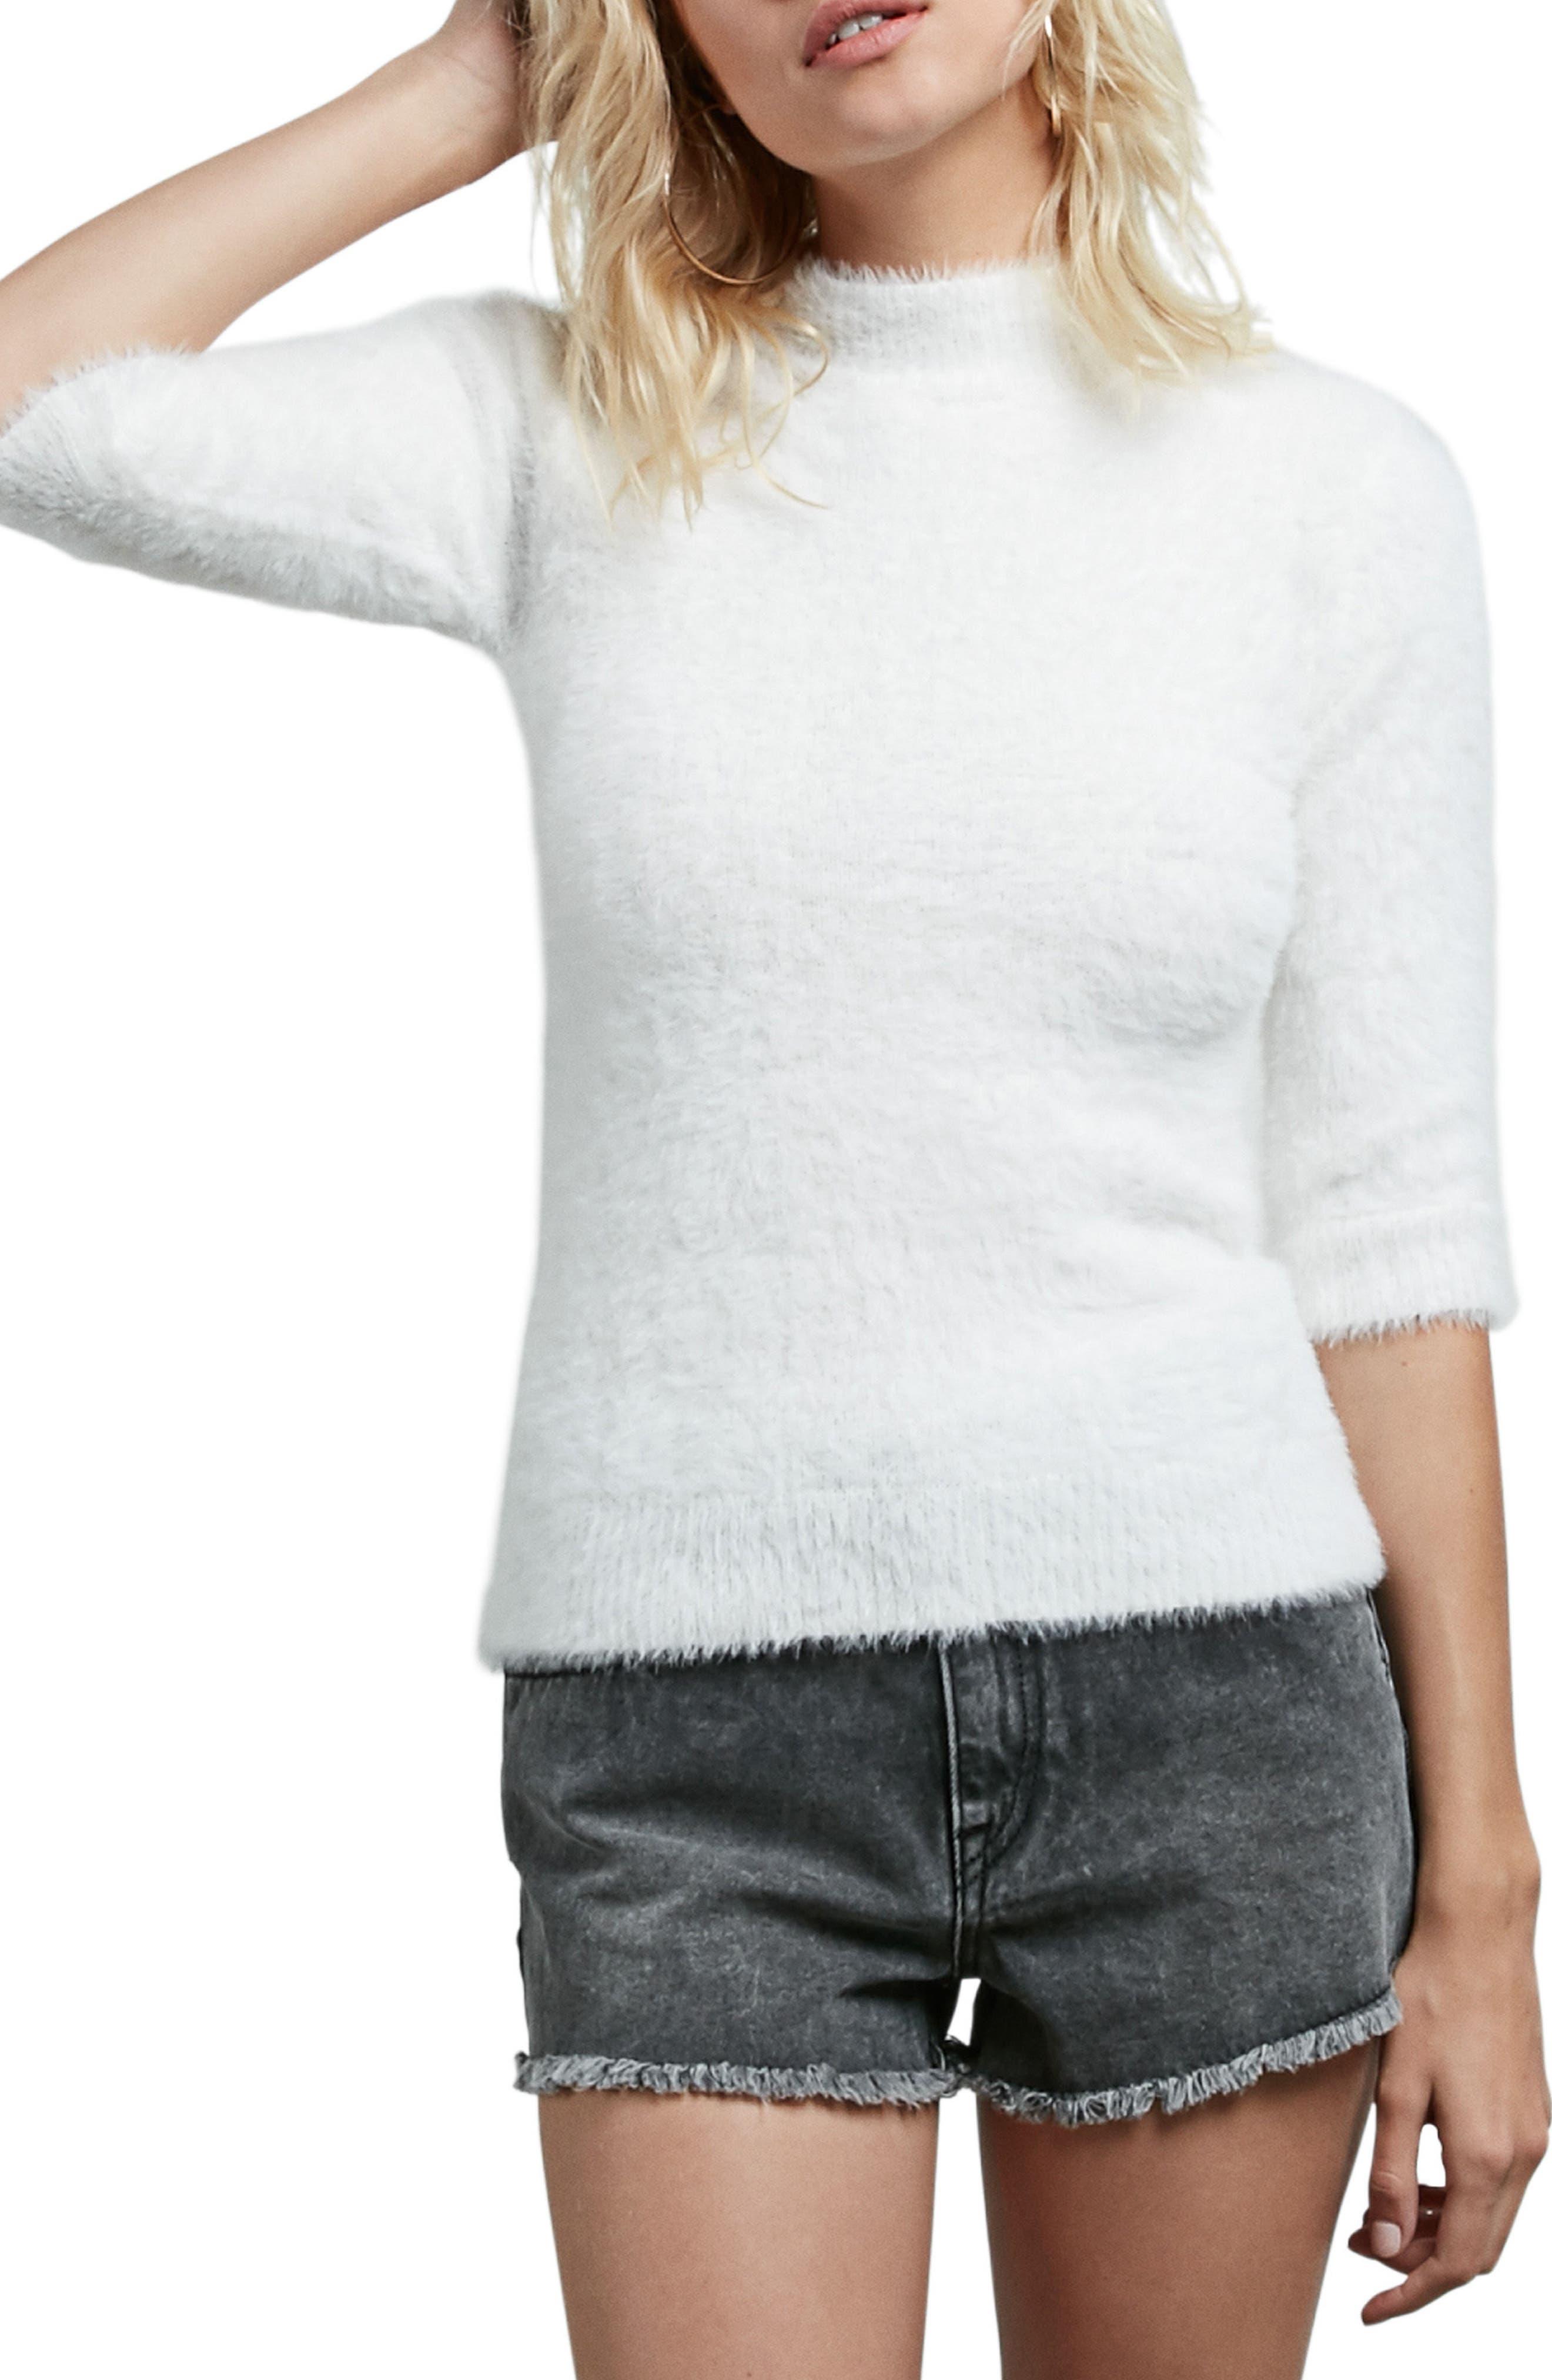 Bunney Riot Sweater,                             Main thumbnail 1, color,                             109